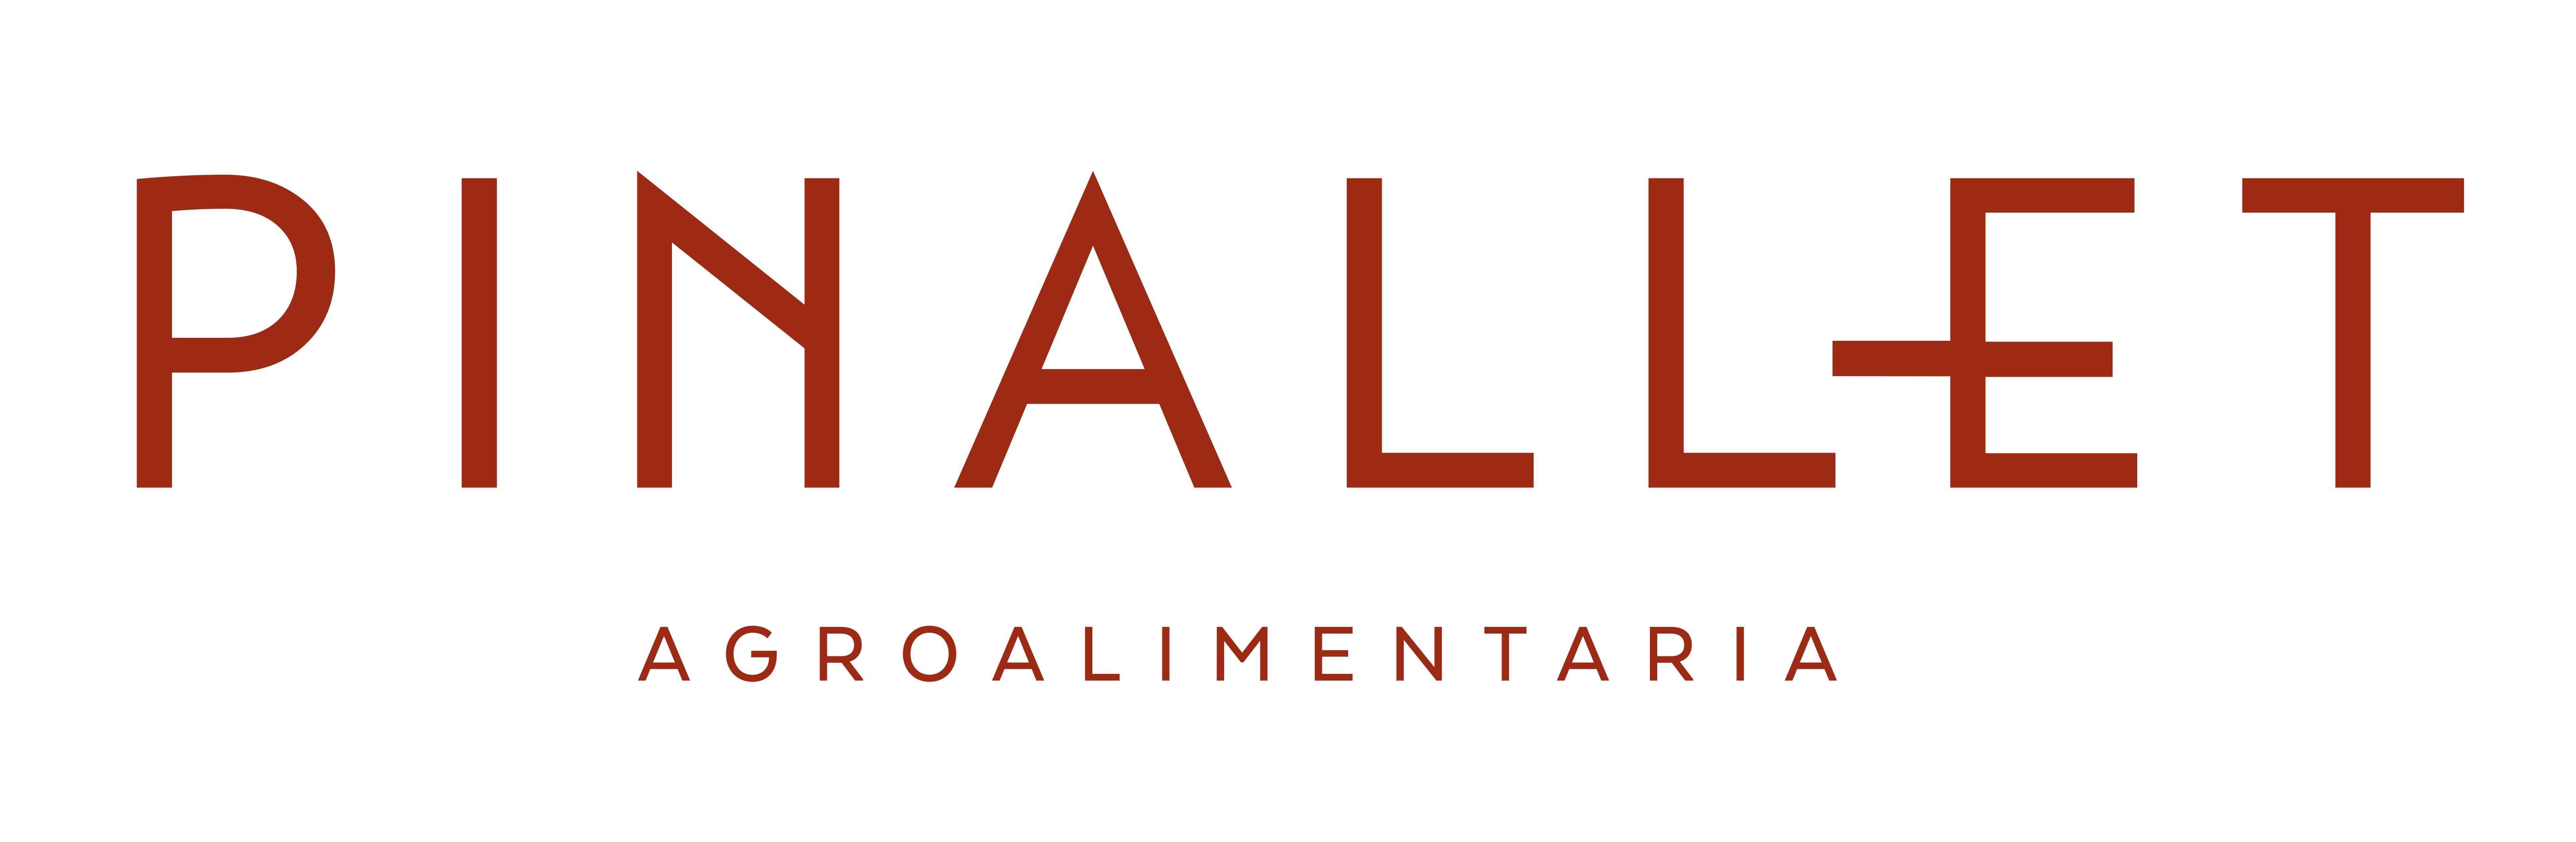 www.pinallet.com